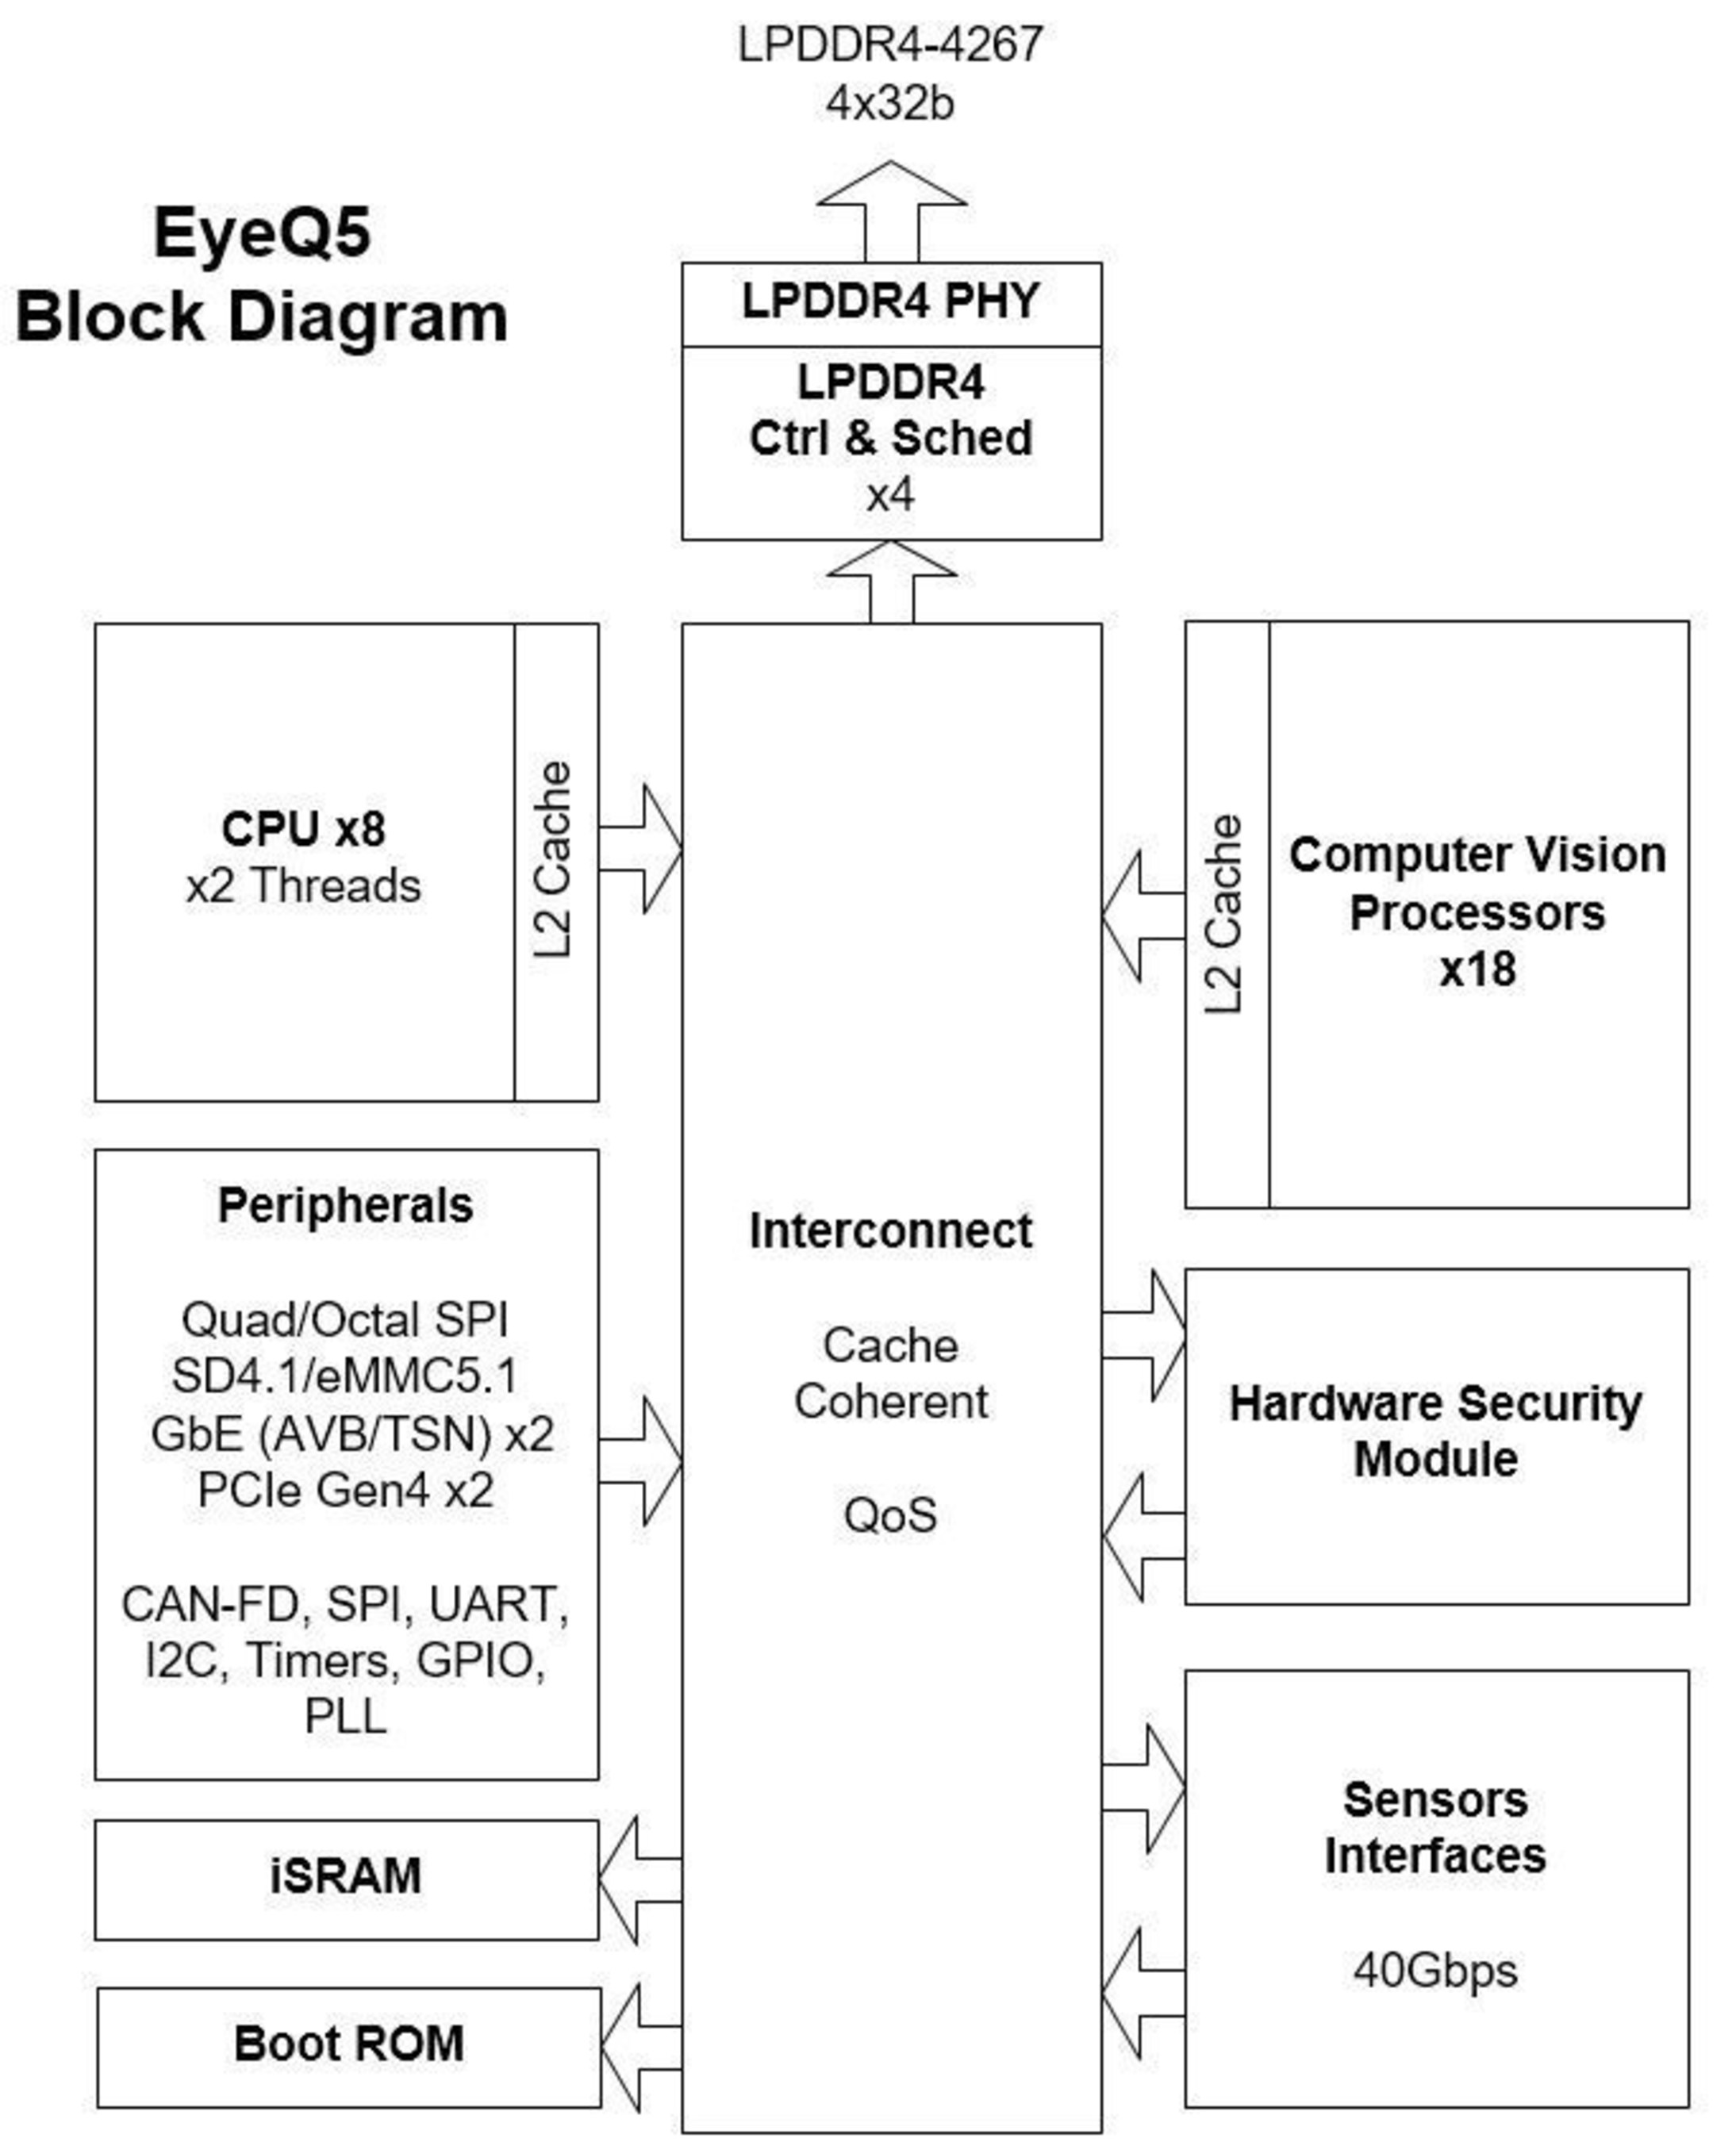 EyeQ5 Block Diagram